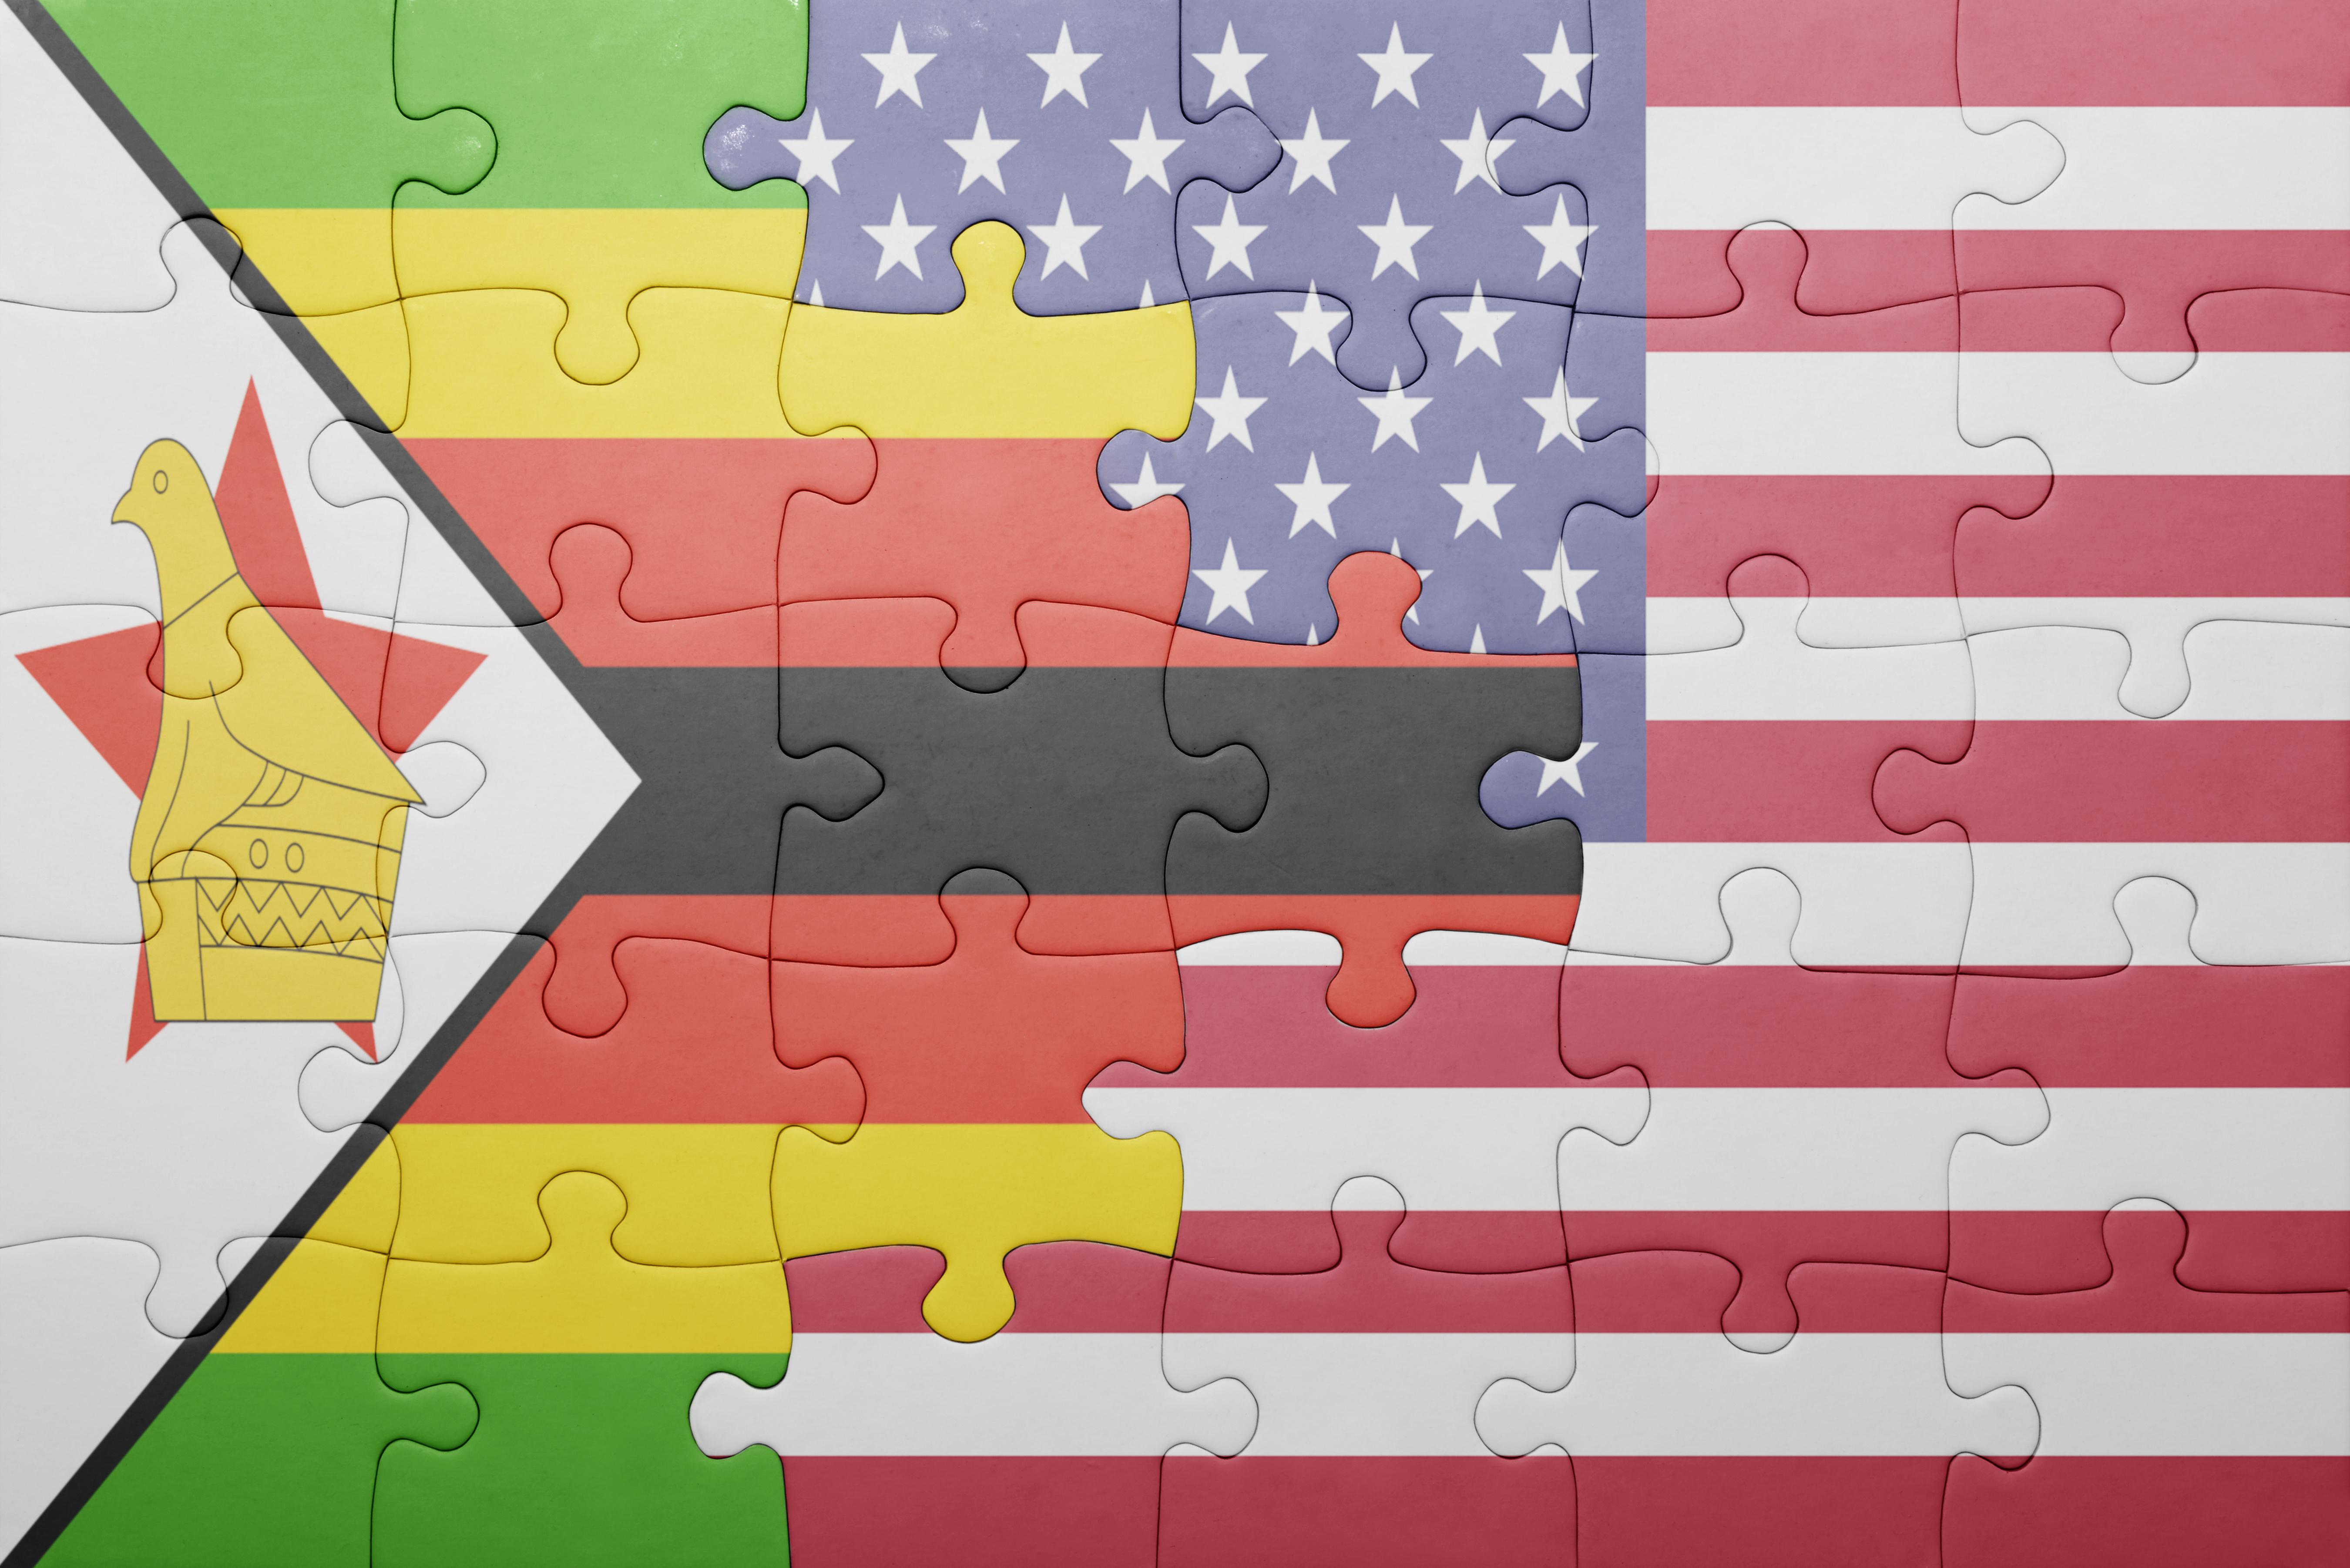 U.S. Arab community – growing influence